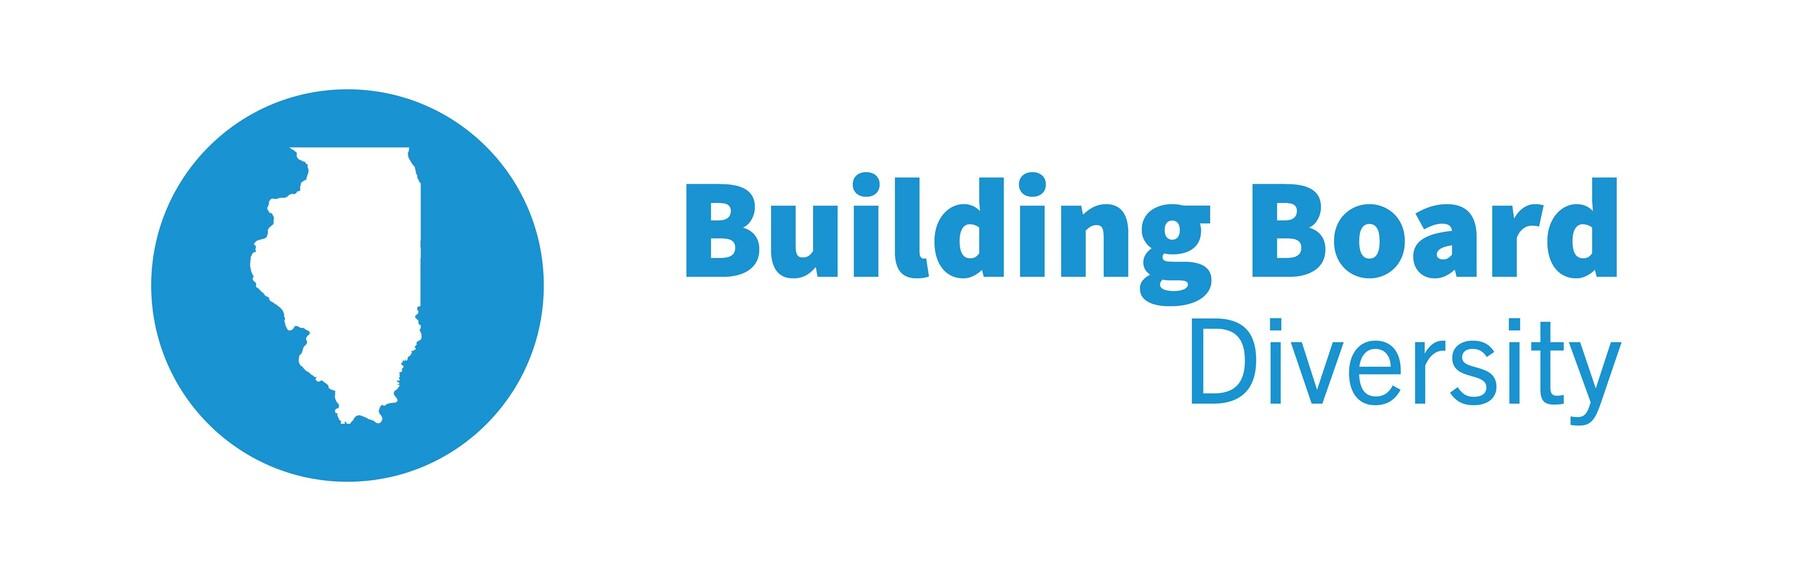 Building Board Diversity Logo